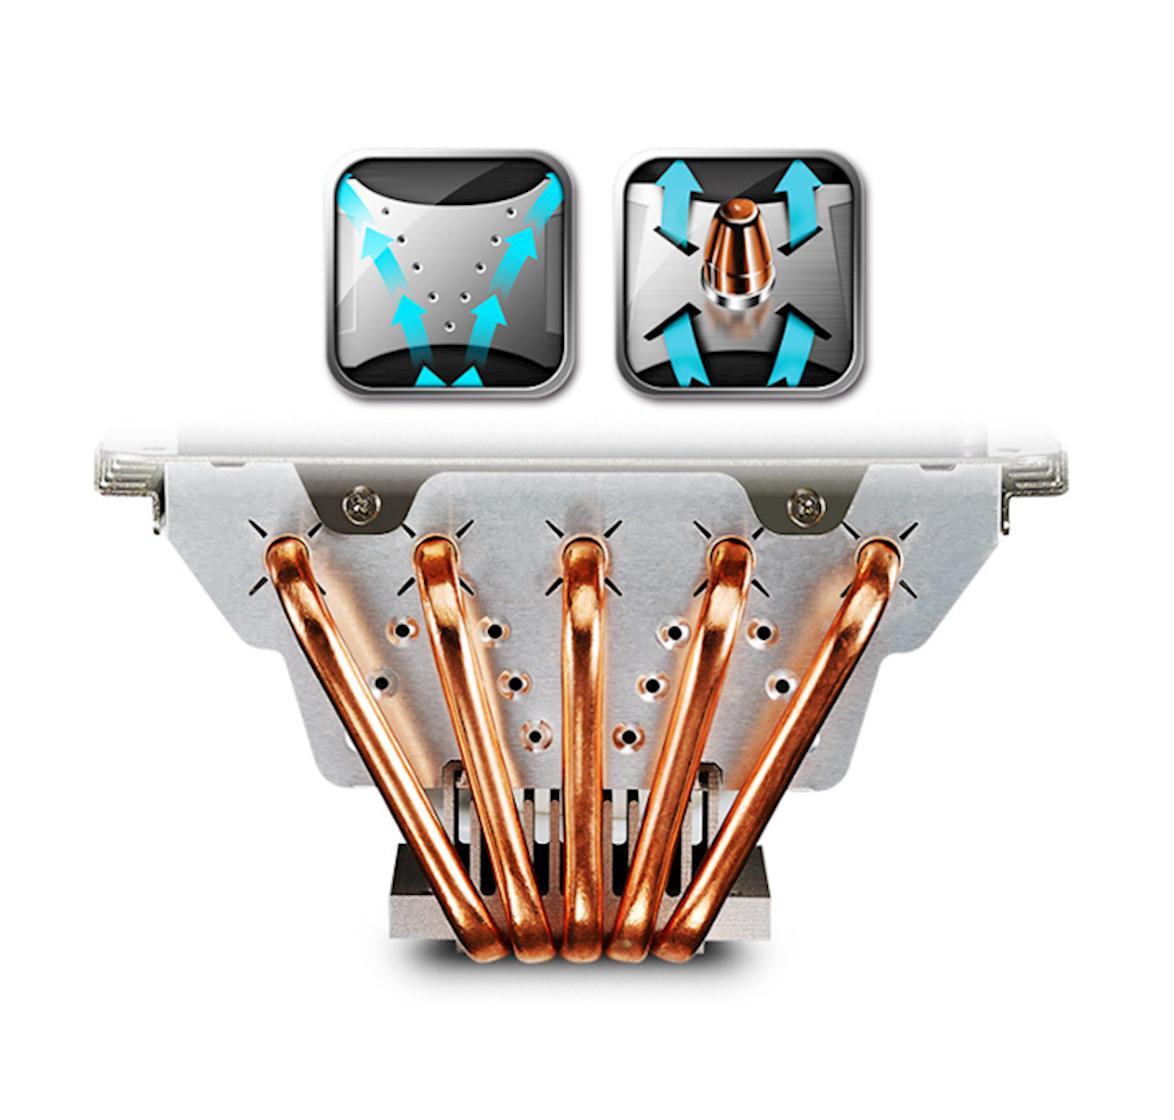 X-Vents & Air-Guide Design